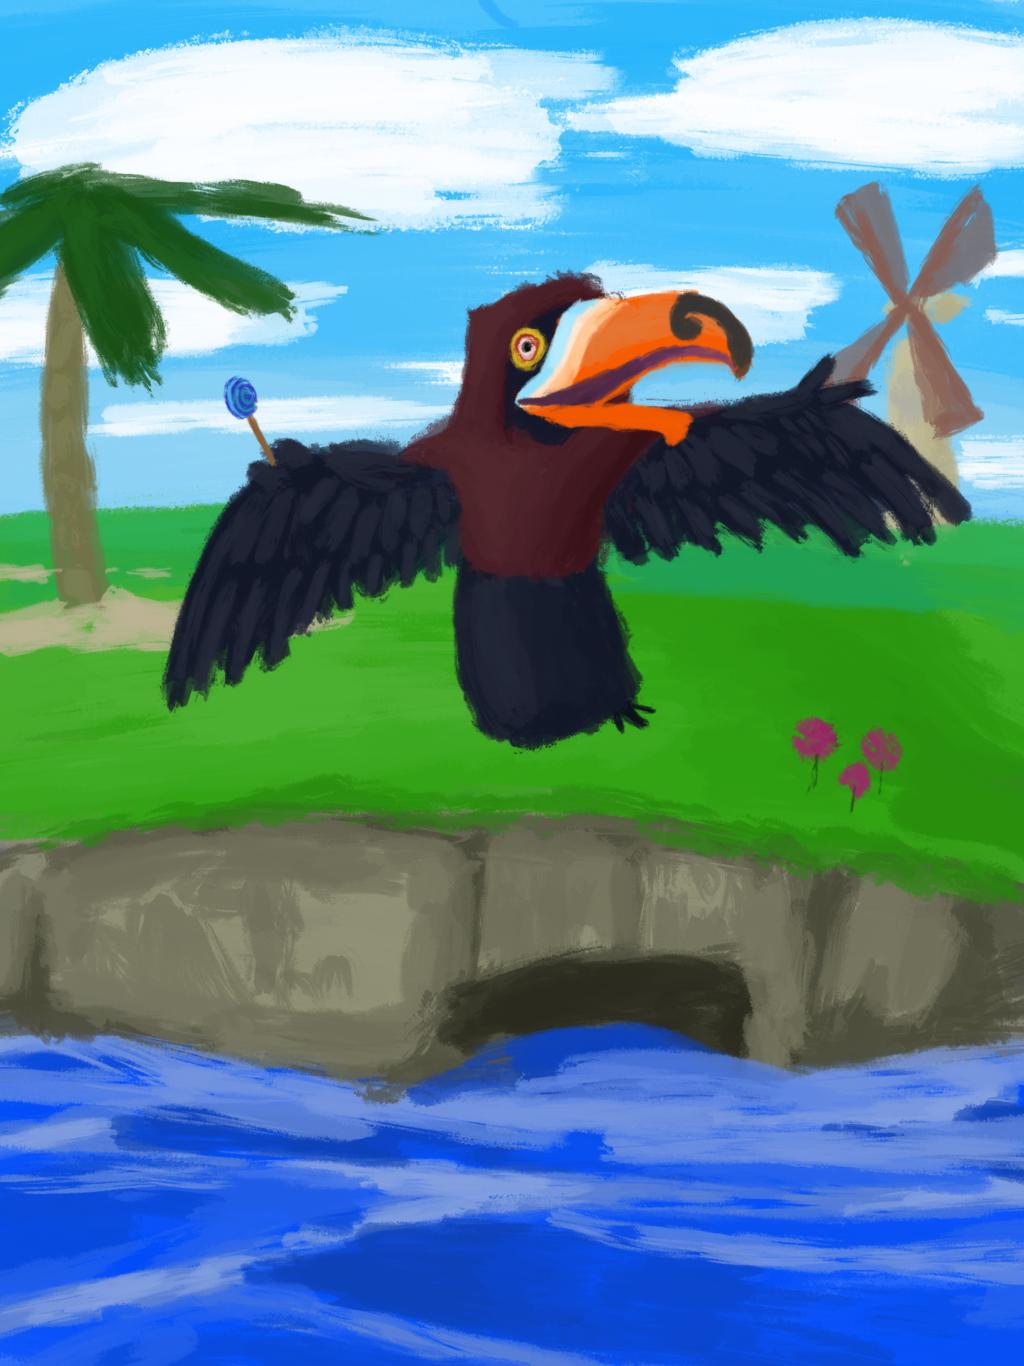 Decembird #4